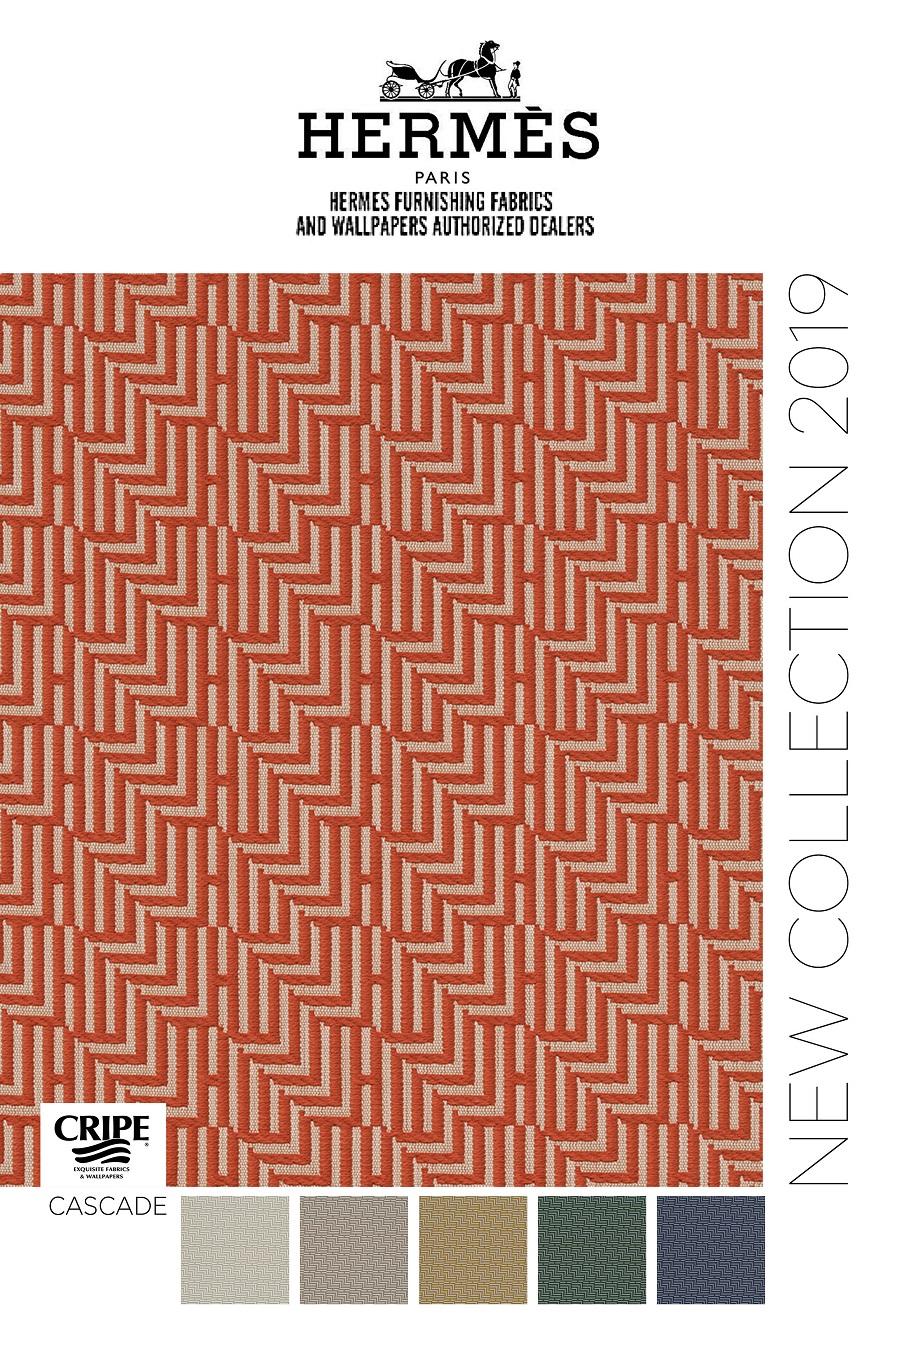 CRIPE PRESENTATION-HERMES-COLLECTION 2019-12